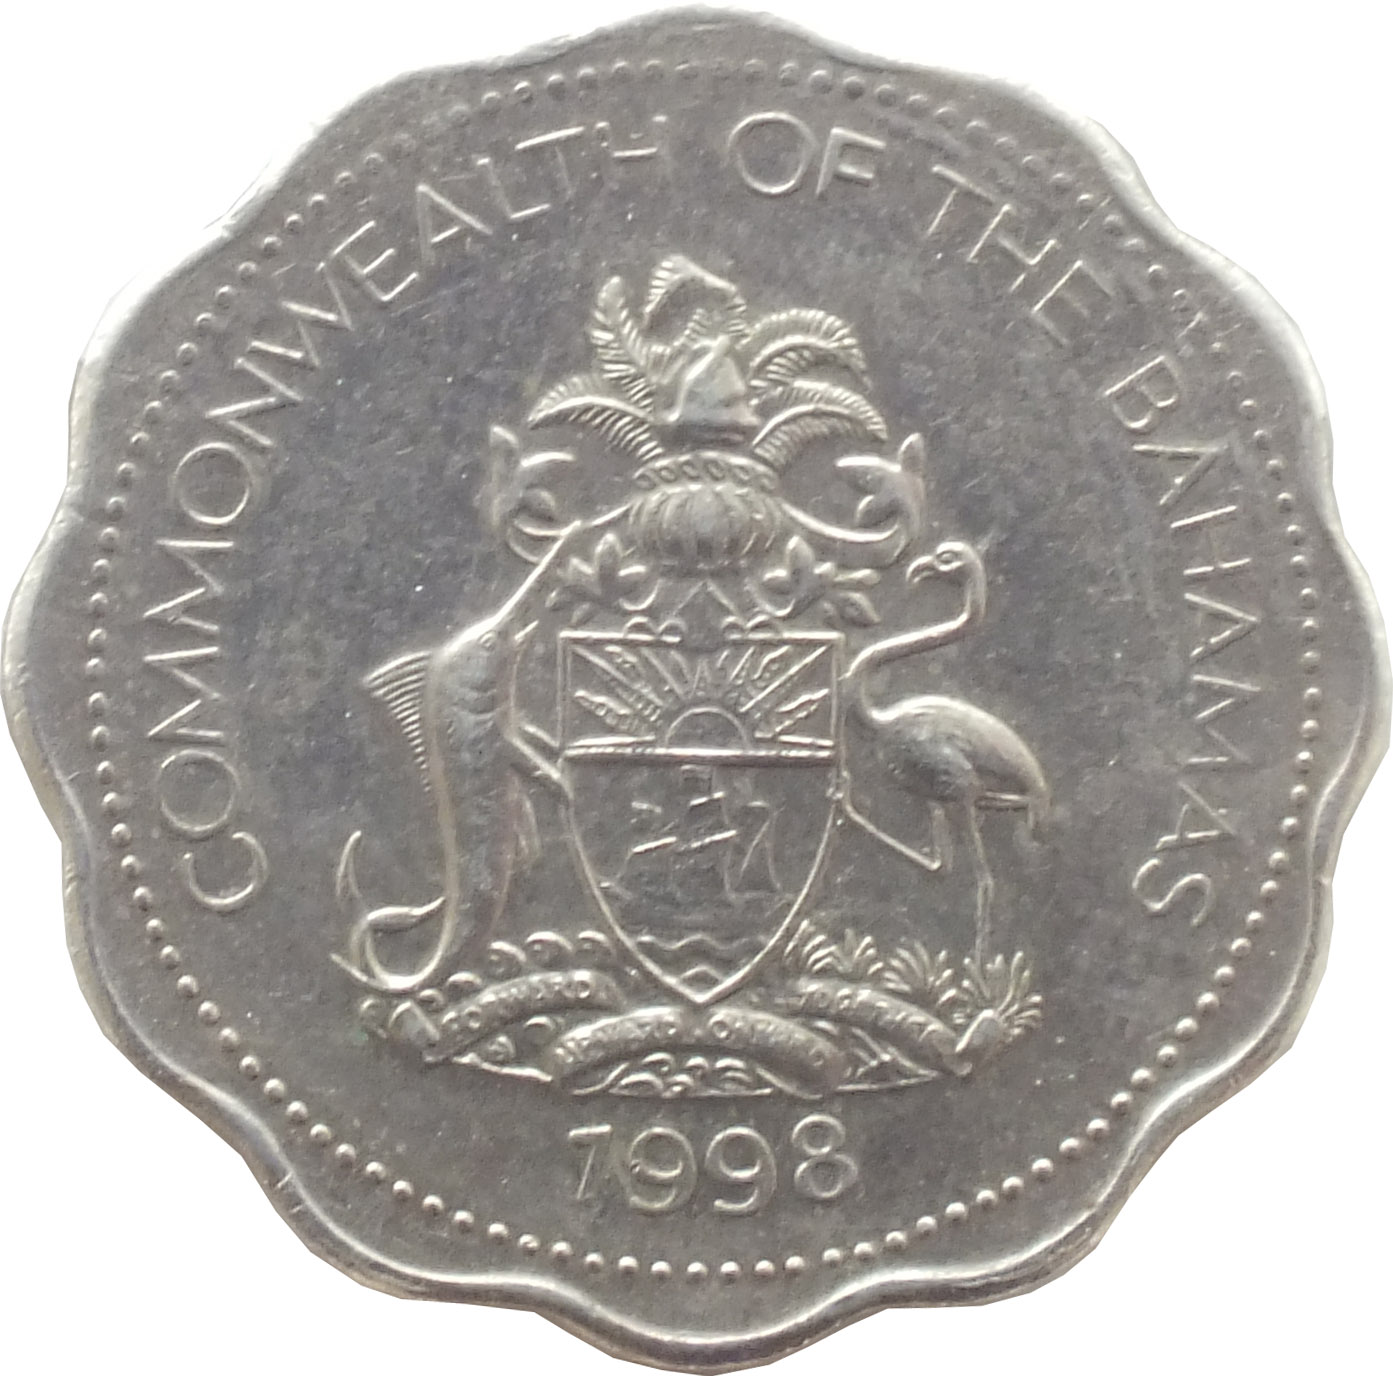 10 Cents Elizabeth Ii 1974 2005 Bahamas Km 61 Coinsbook